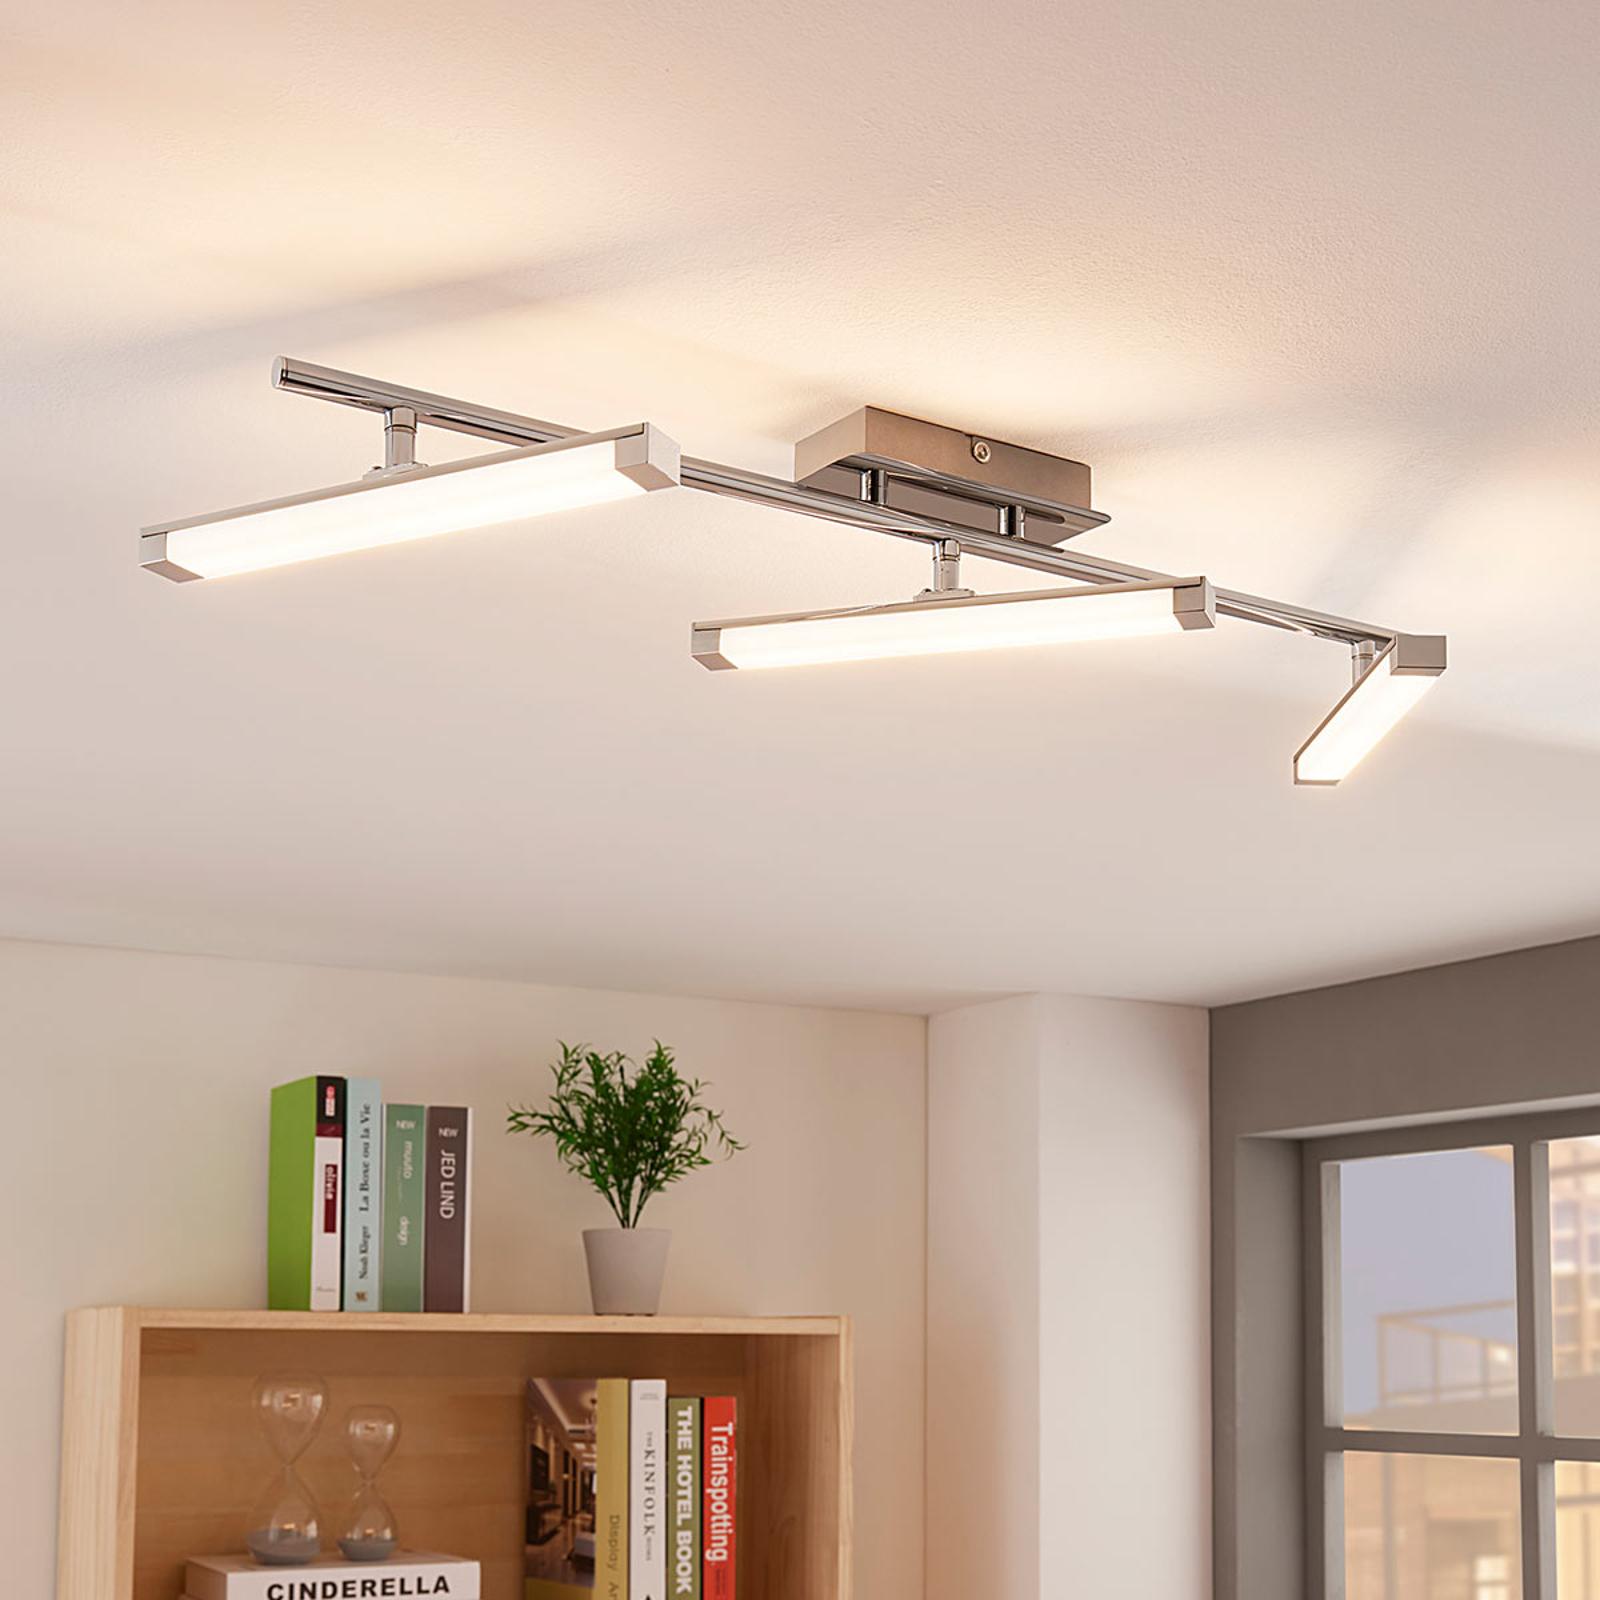 LED-taklampe Pilou kan dimmes med bryter